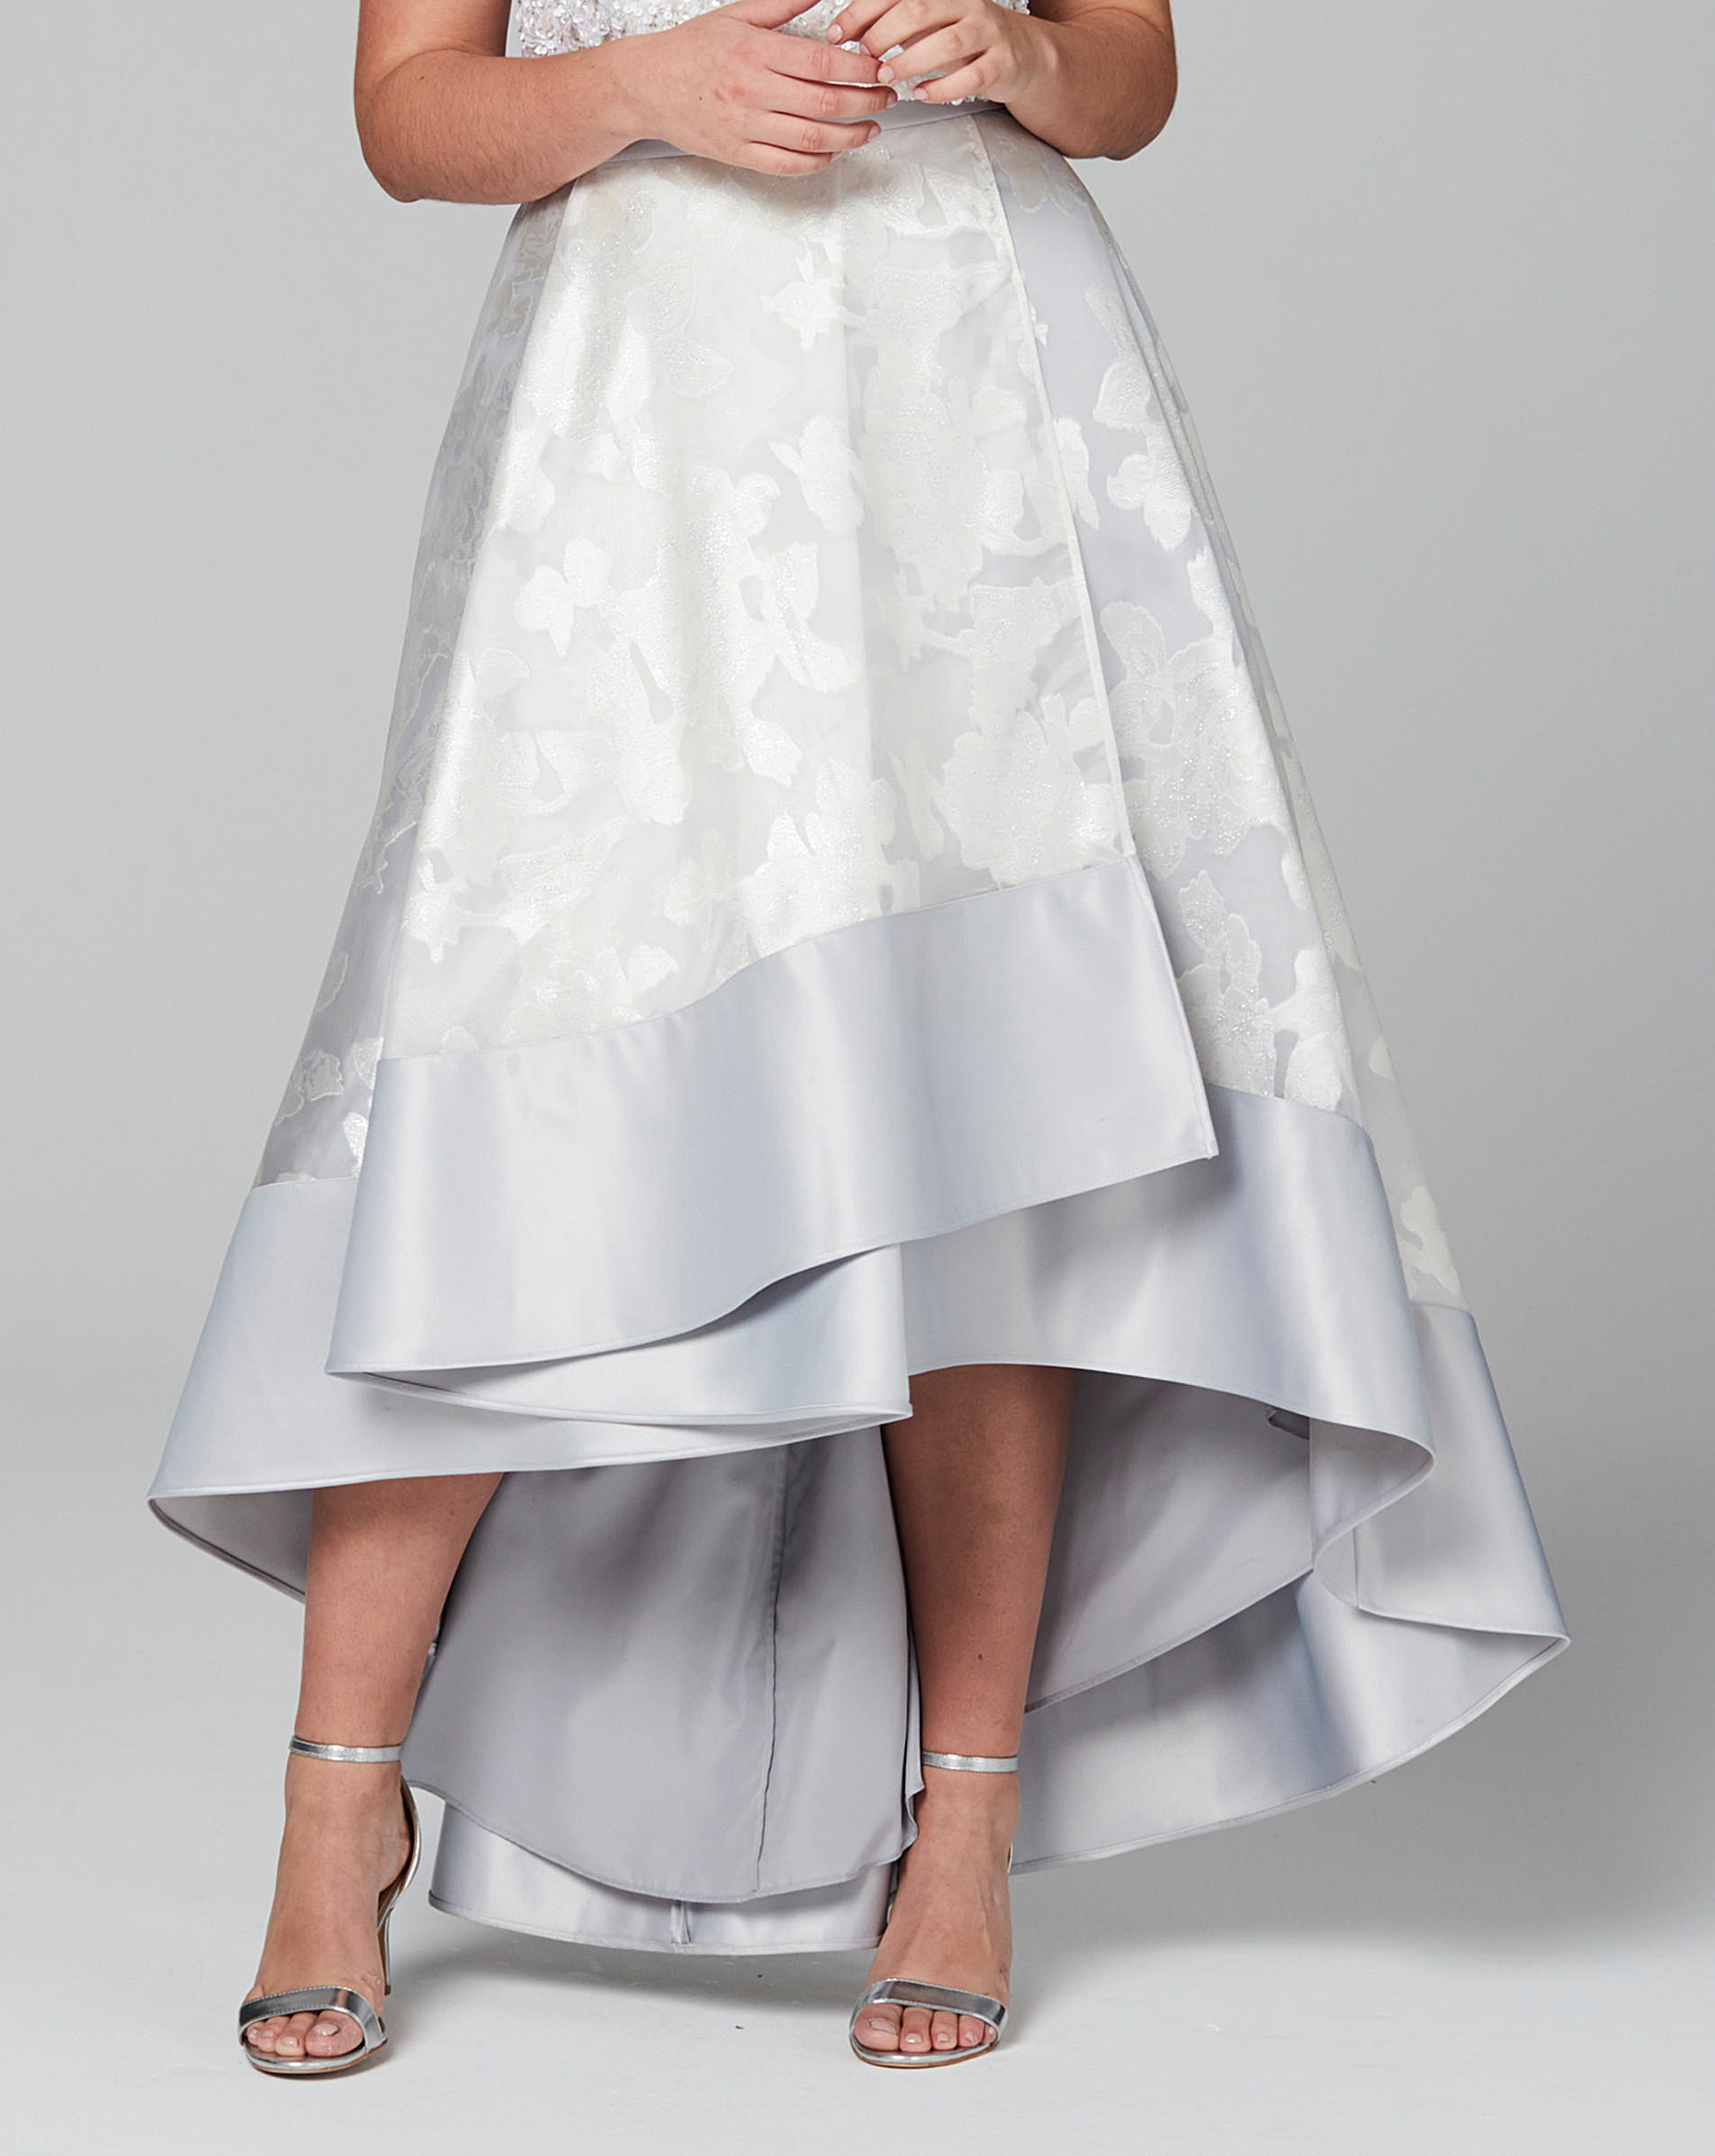 04a19d4d9 Coast Silver Floral Rhian Skirt | J D Williams